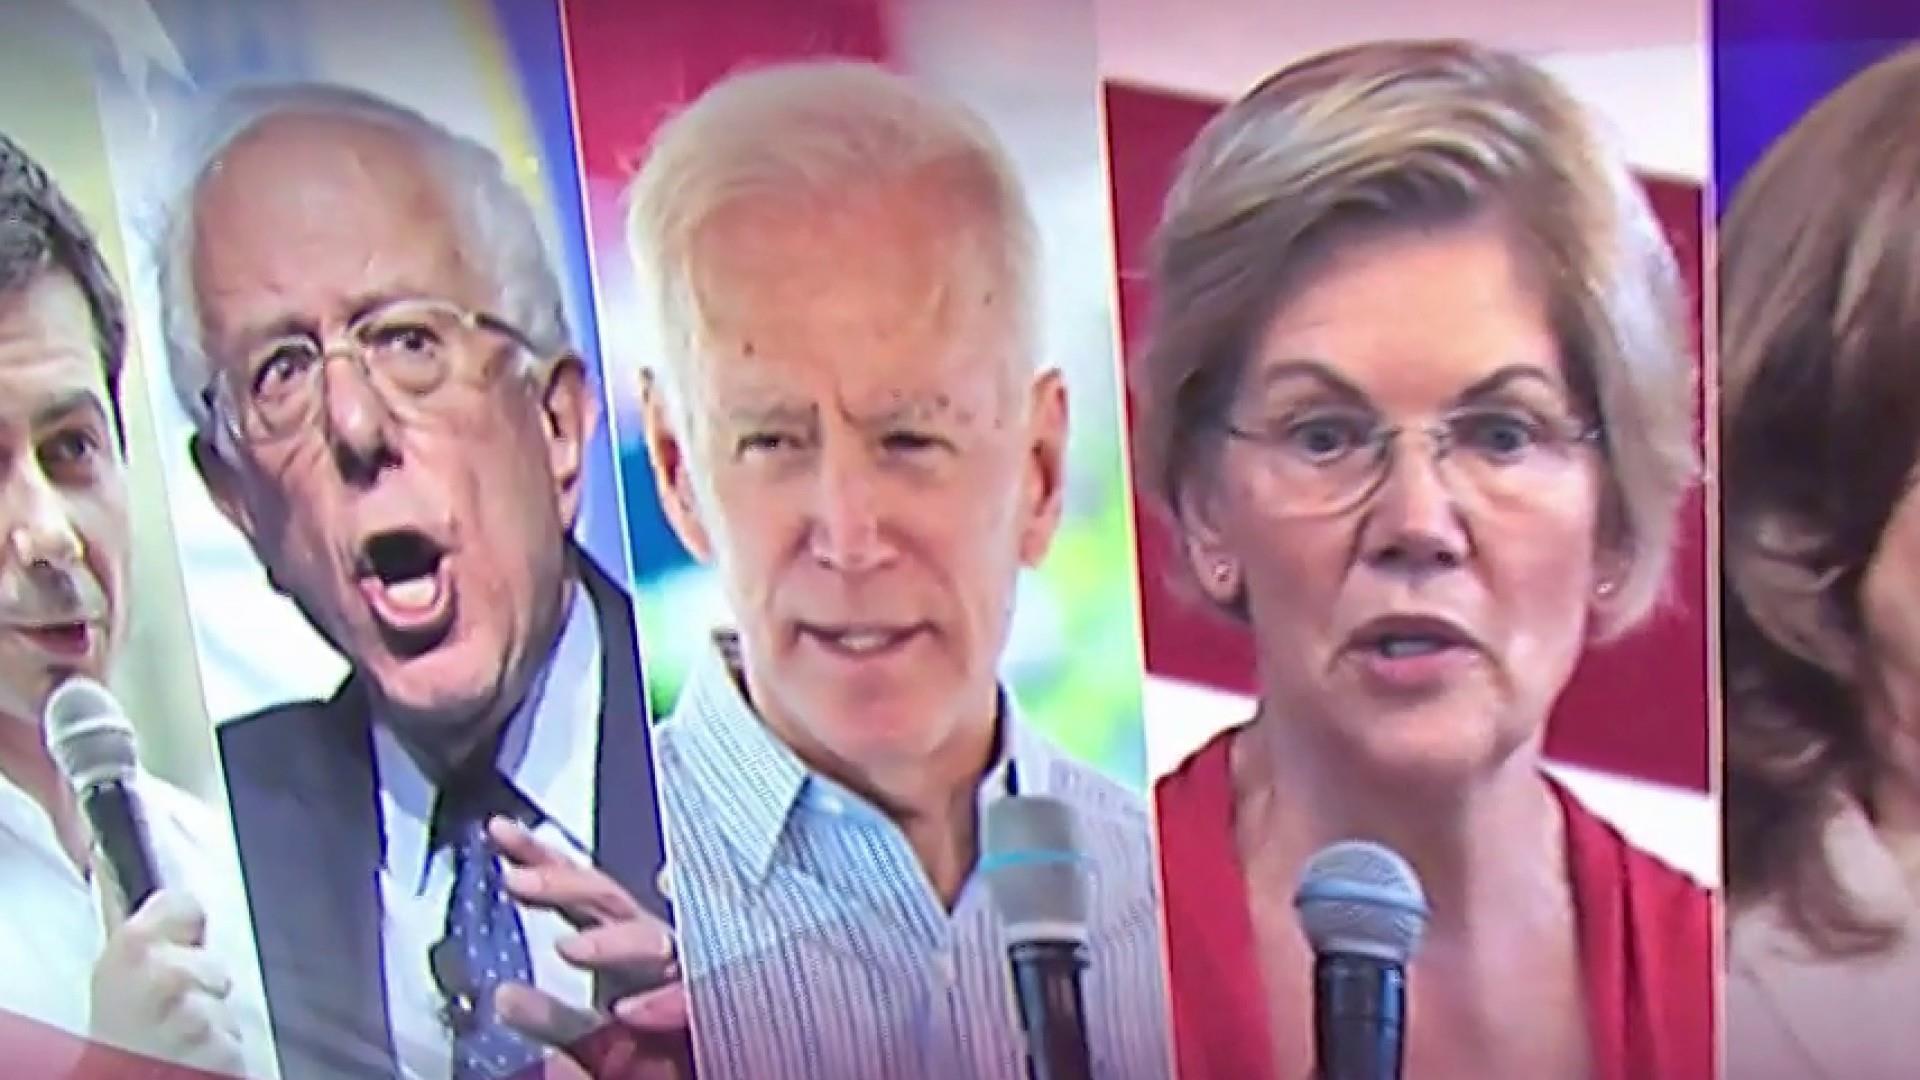 Joe Biden, Bernie Sanders, and Elizabeth Warren to share debate stage for the first time